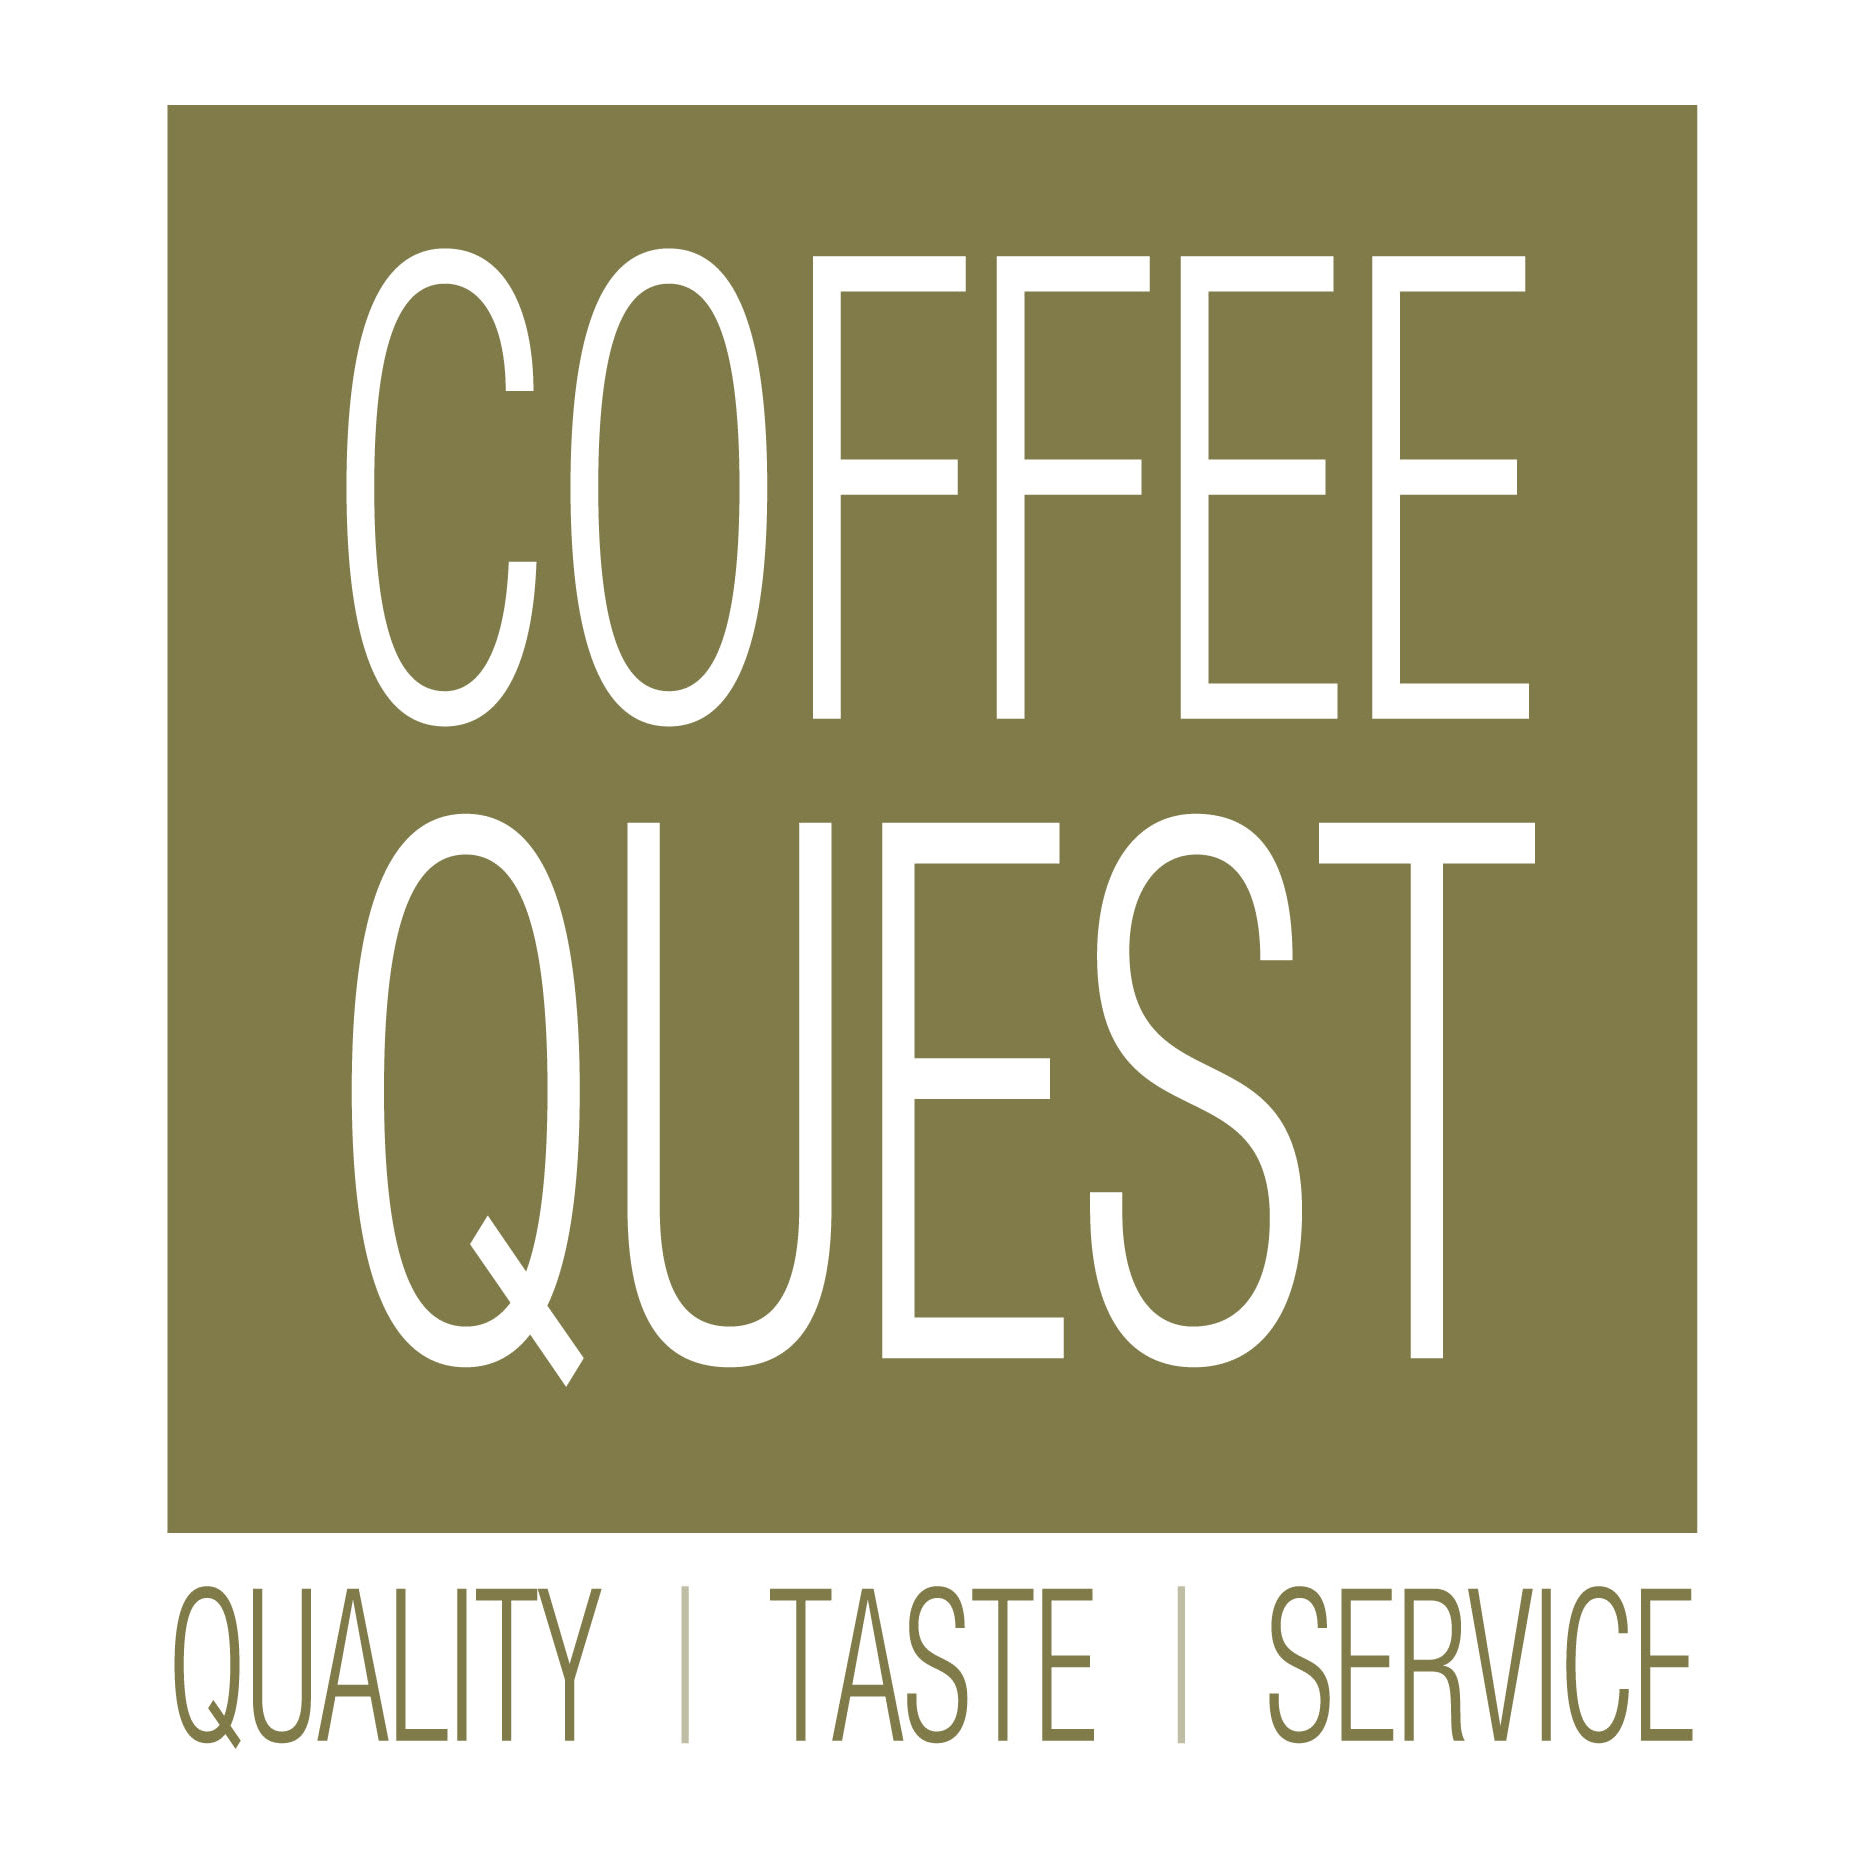 Coffee Quest Ltd - Norwich, Norfolk NR9 5LY - 01603 871652 | ShowMeLocal.com